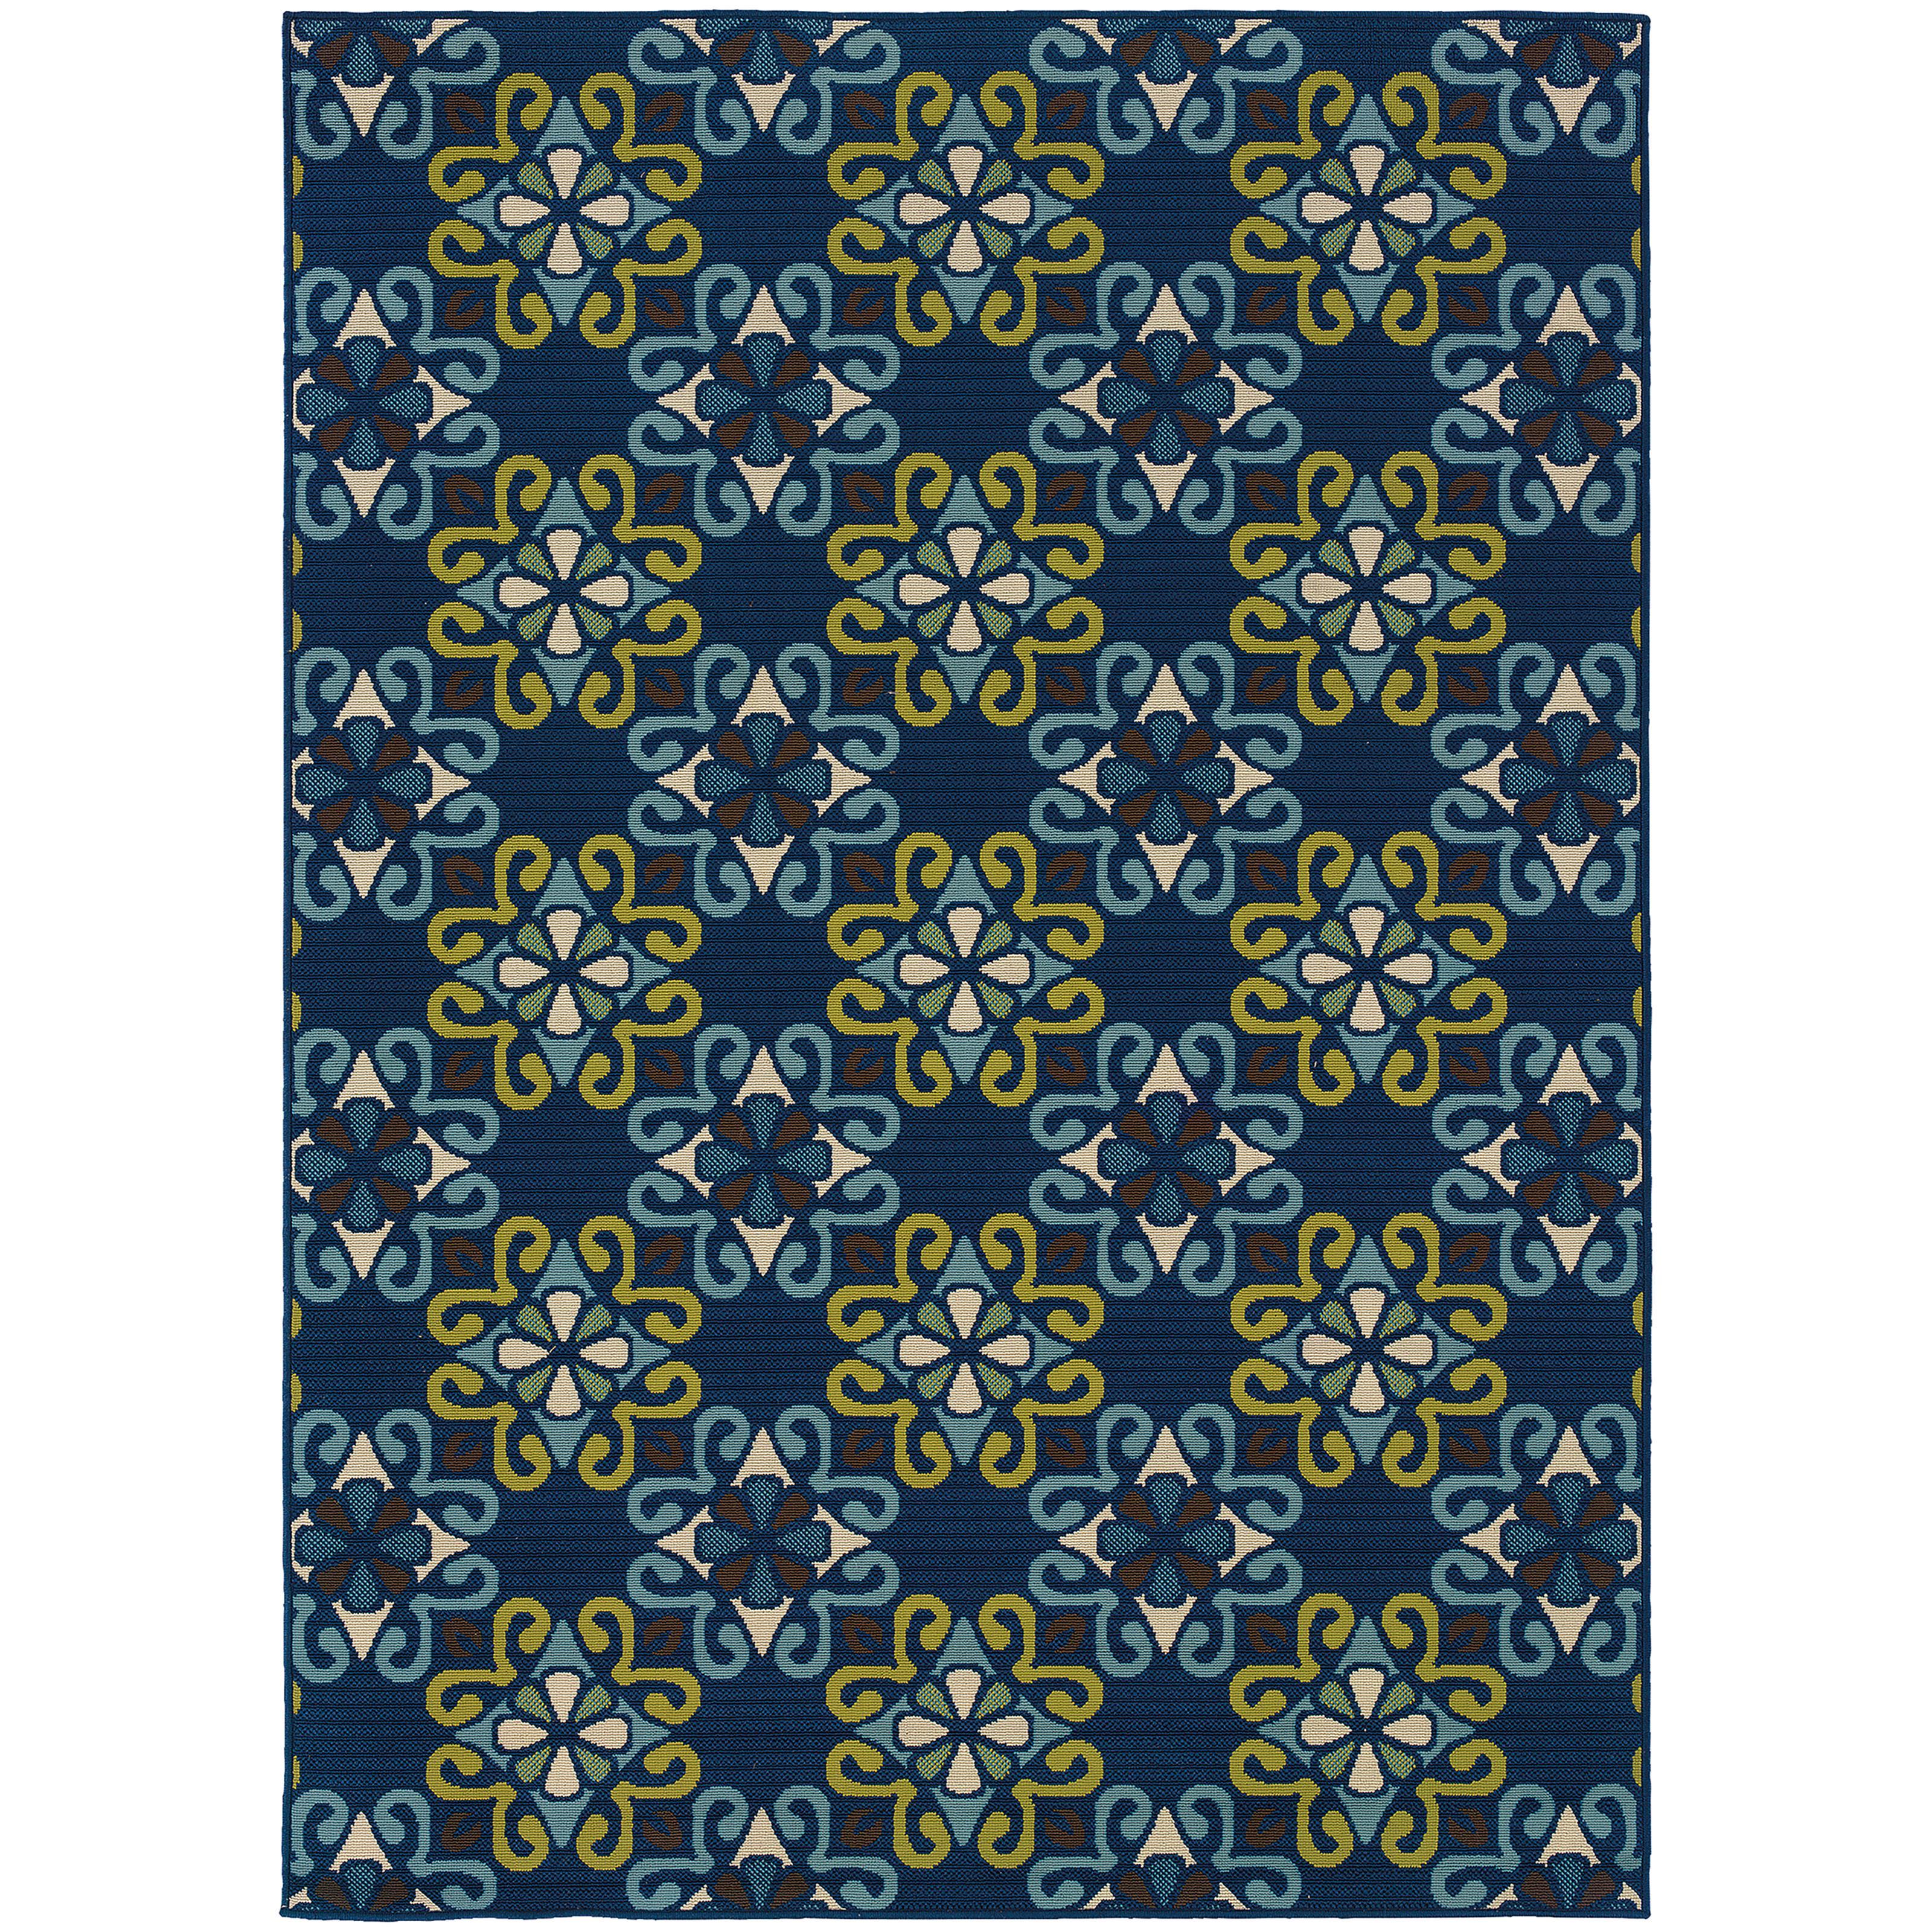 "Oriental Weavers Caspian 3' 7"" X  5' 6"" Rug - Item Number: C3331L110170ST"